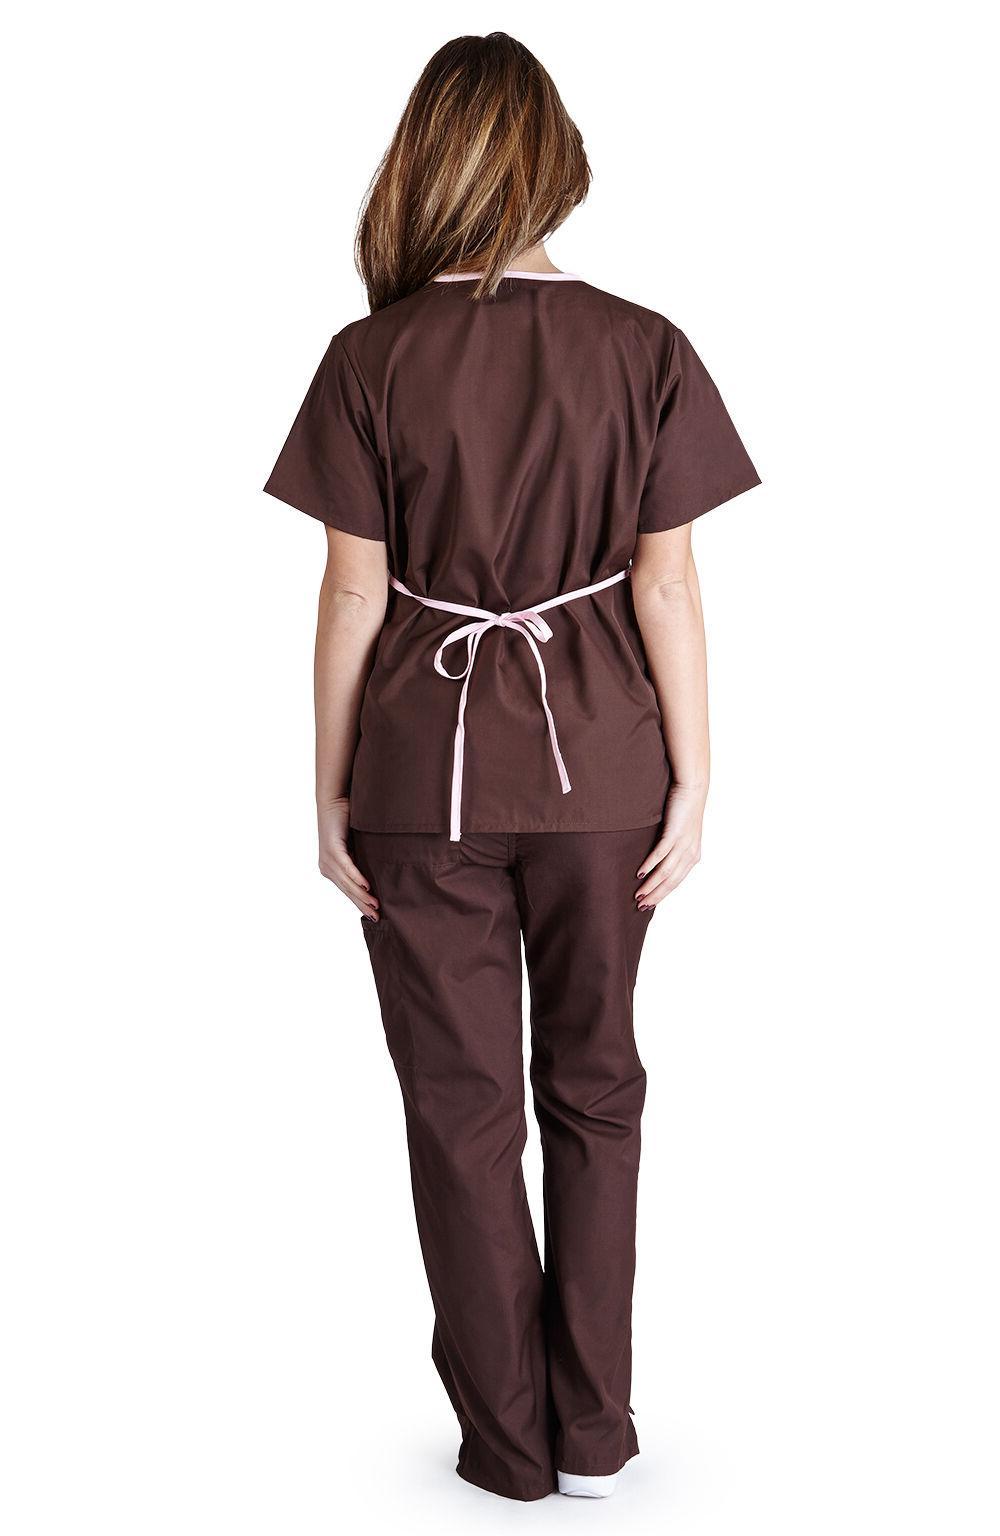 Medical UNIFORMS Contrast Size L XL